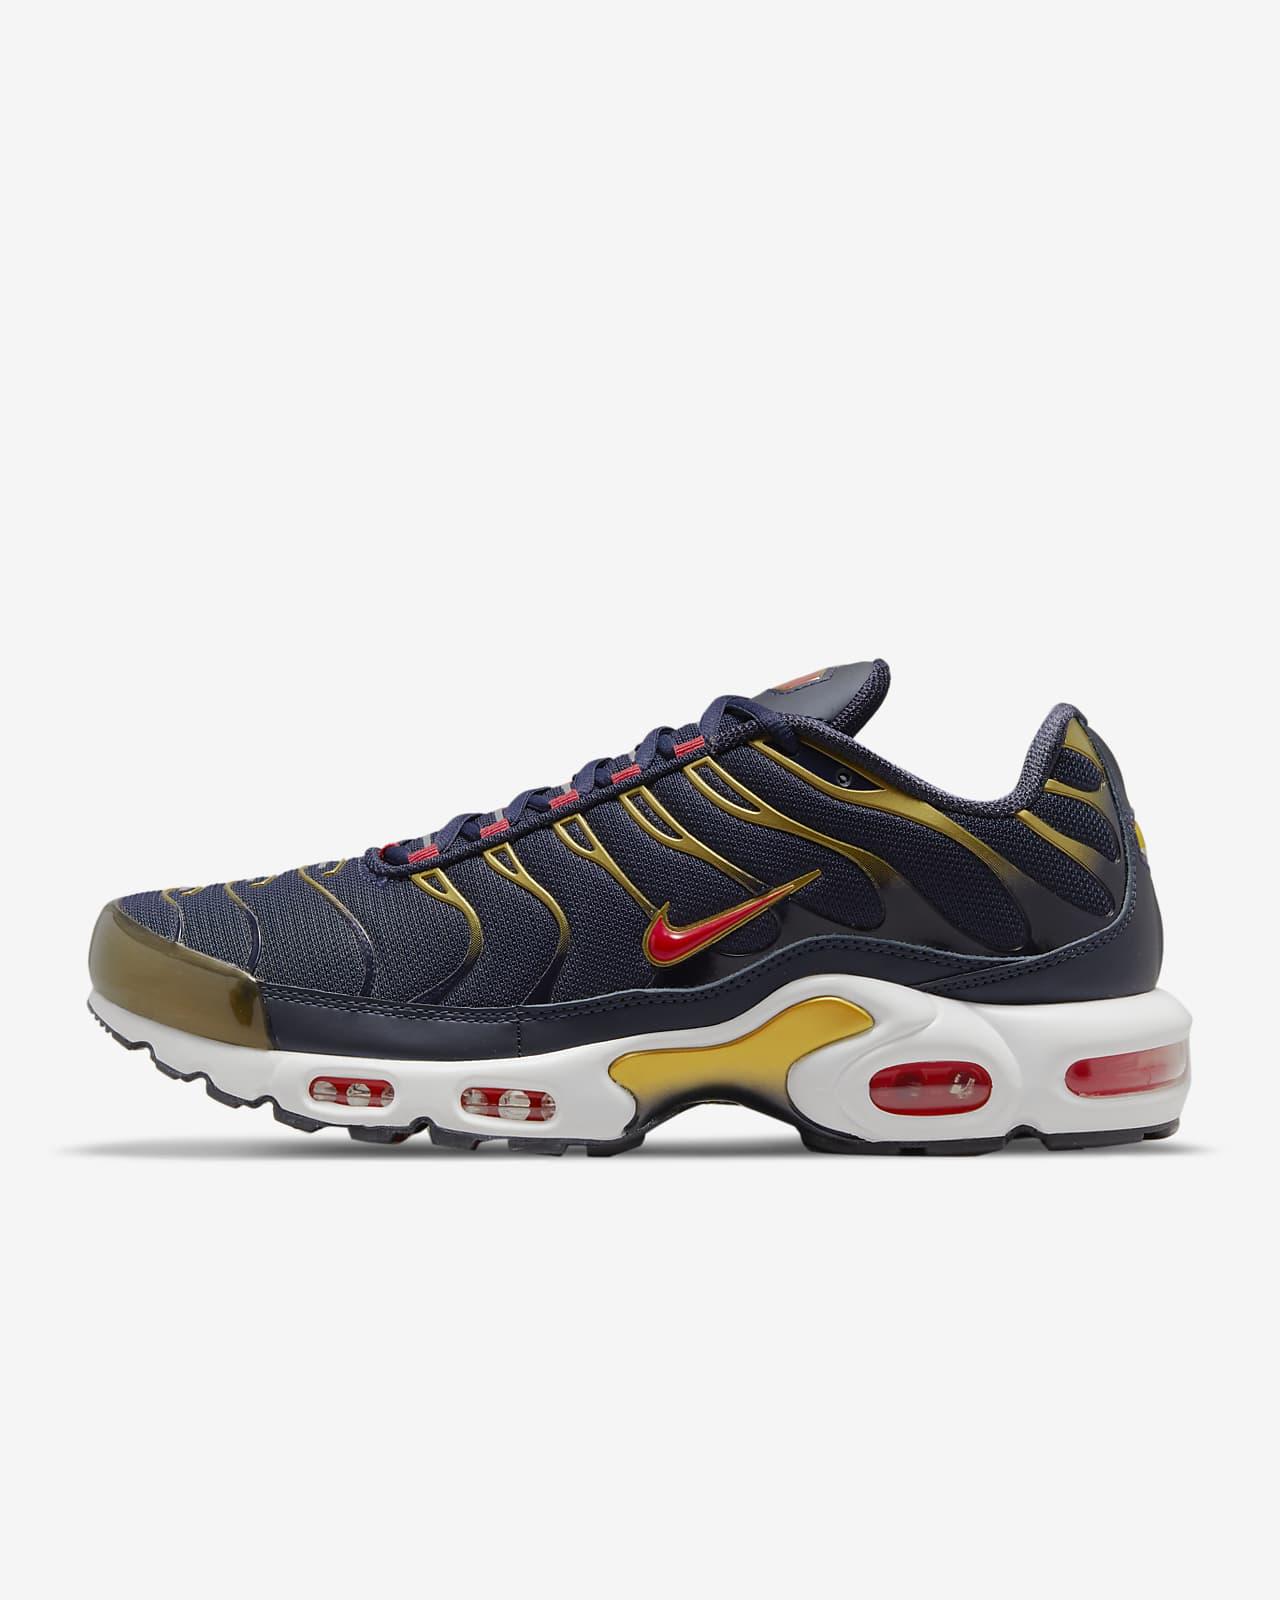 Nike Air Max Plus OG Men's Shoes